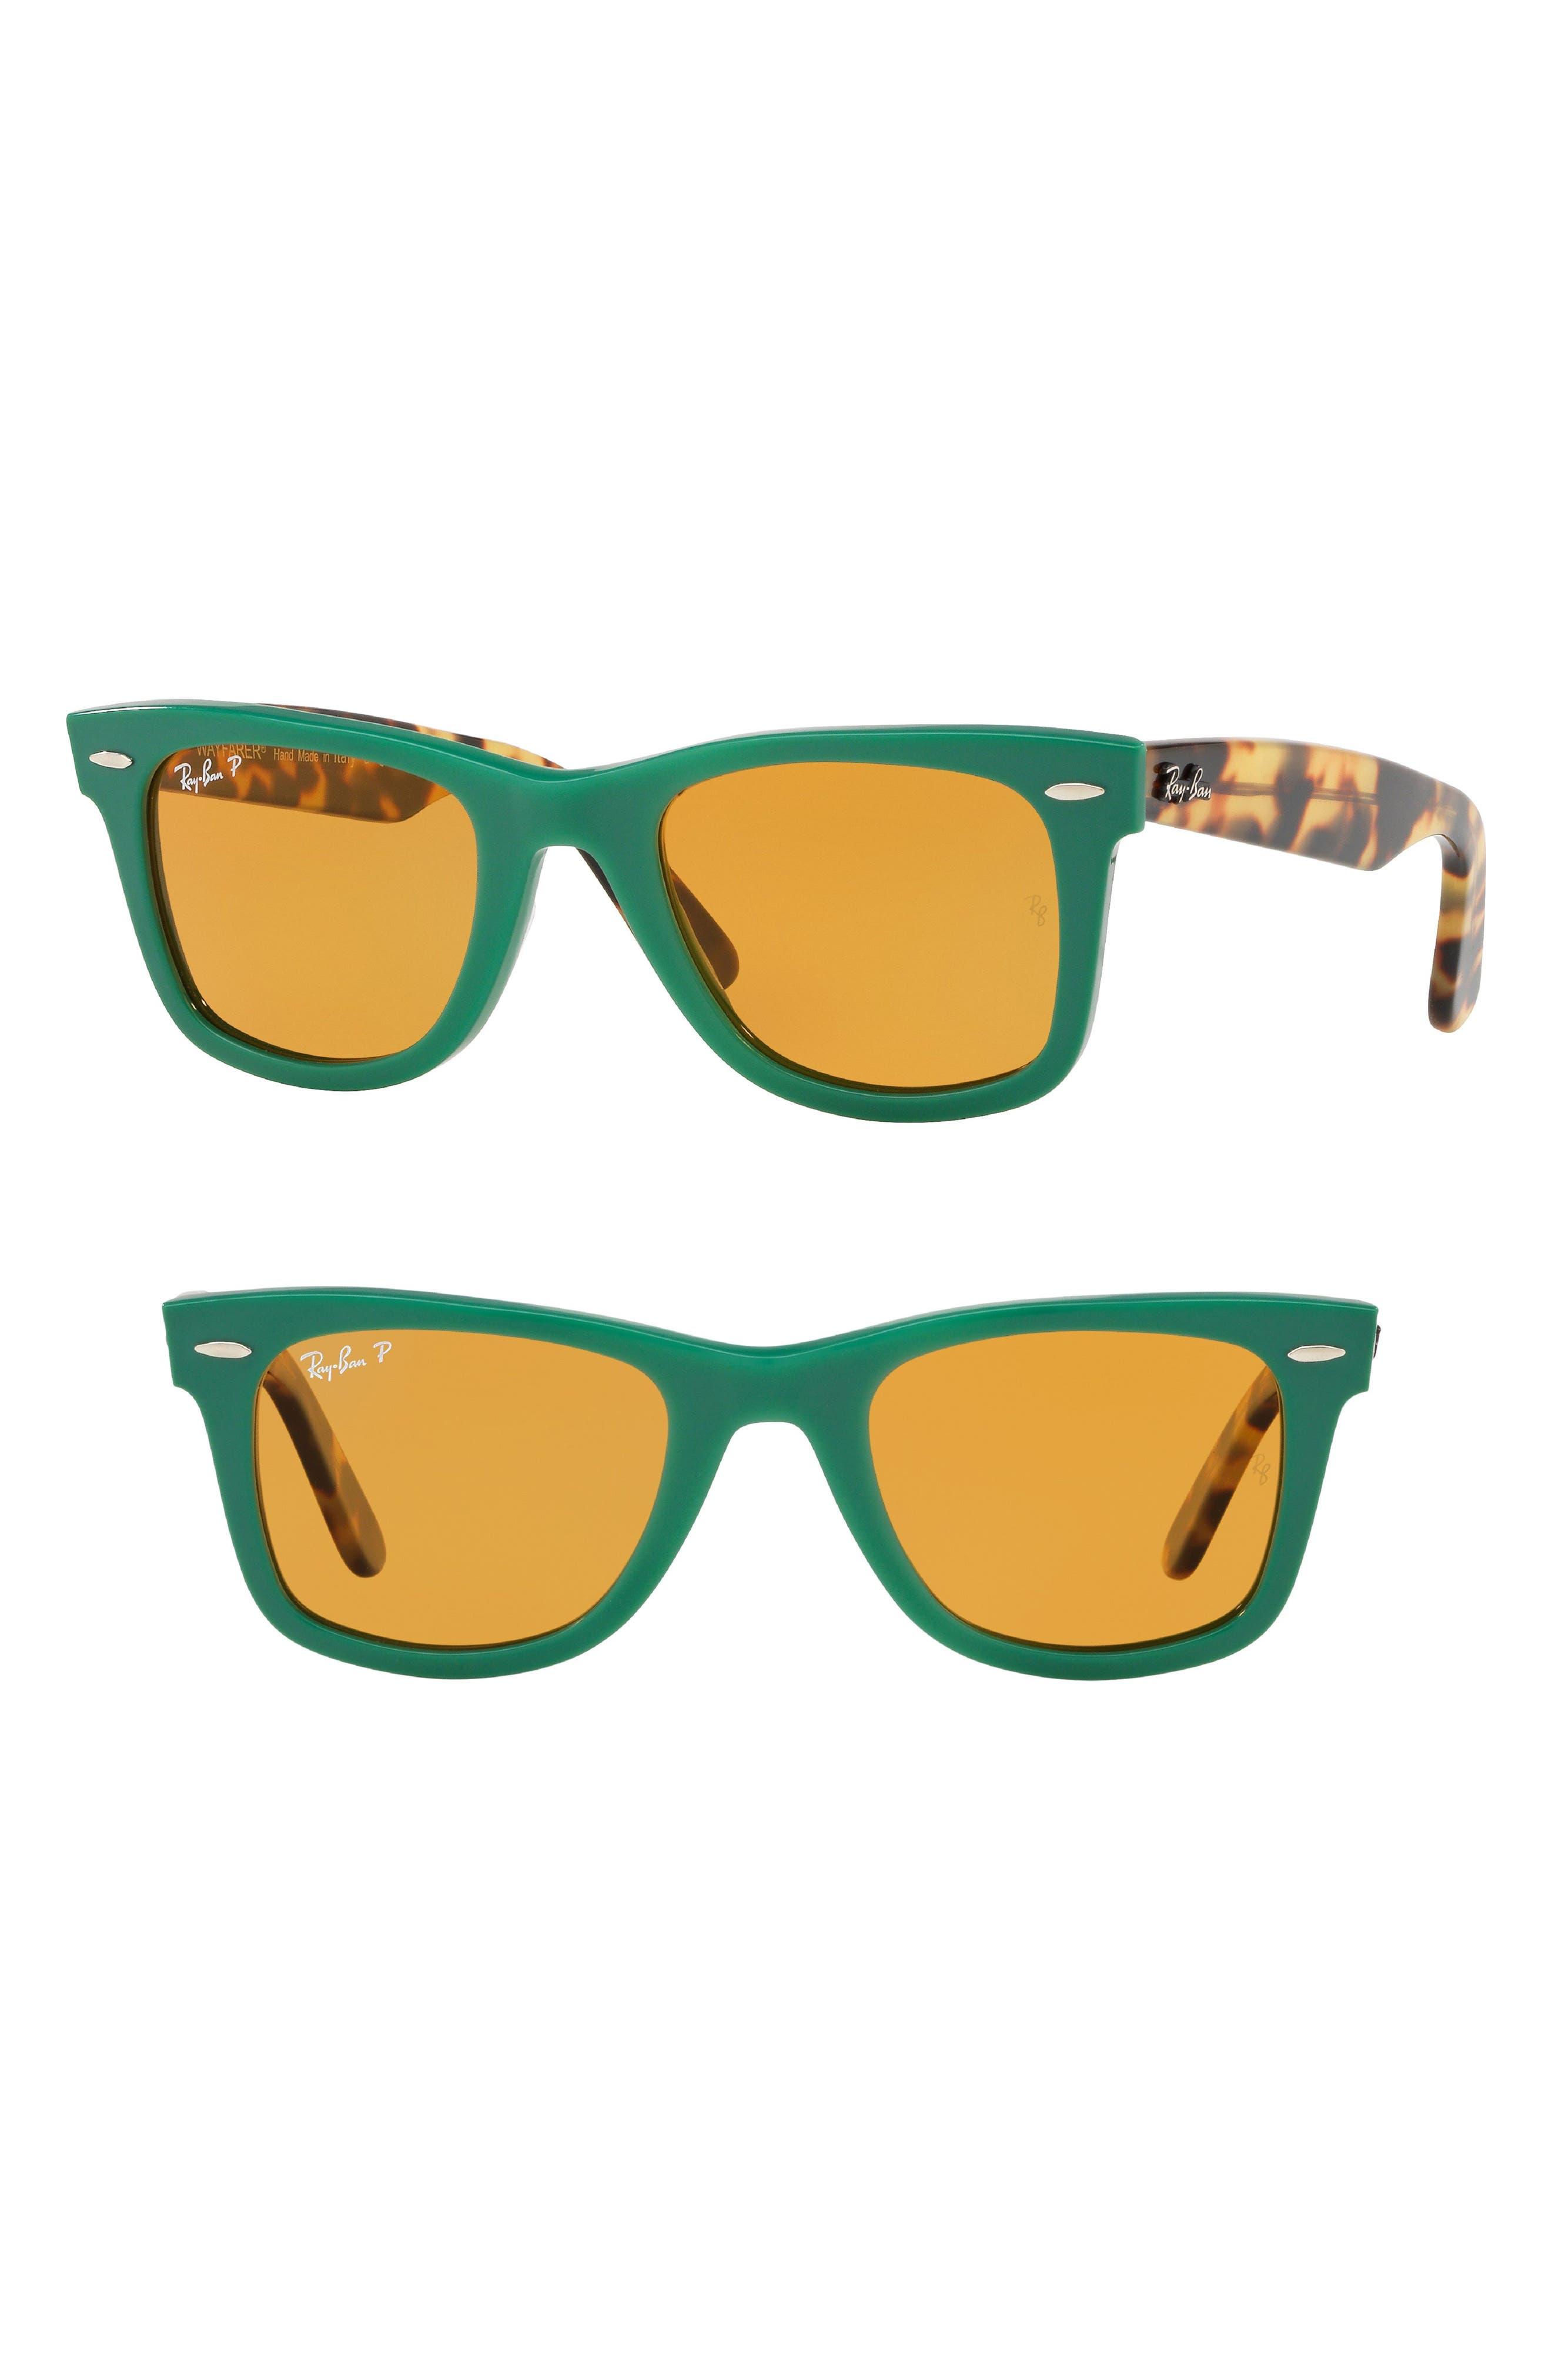 Standard Classic Wayfarer 50mm Polarized Sunglasses,                             Main thumbnail 1, color,                             GREEN